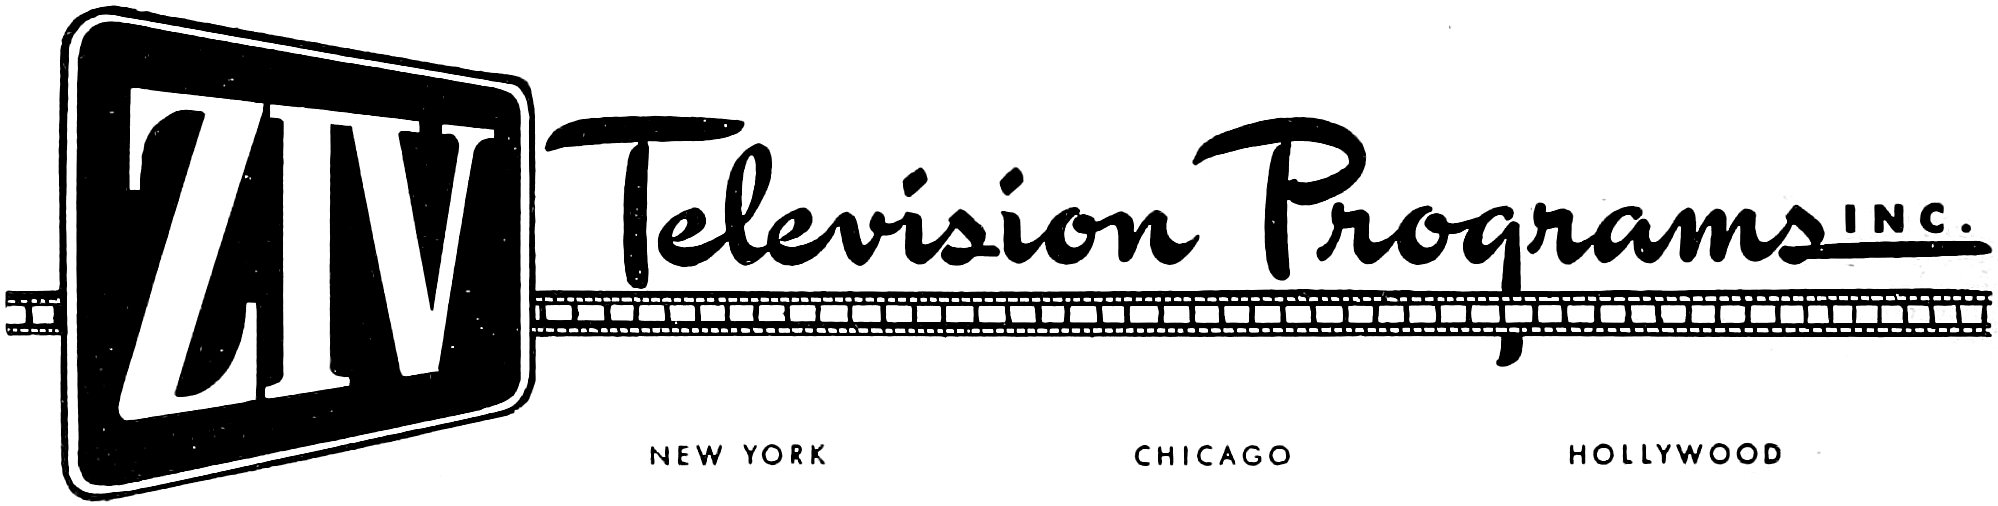 Ziv Television Programs